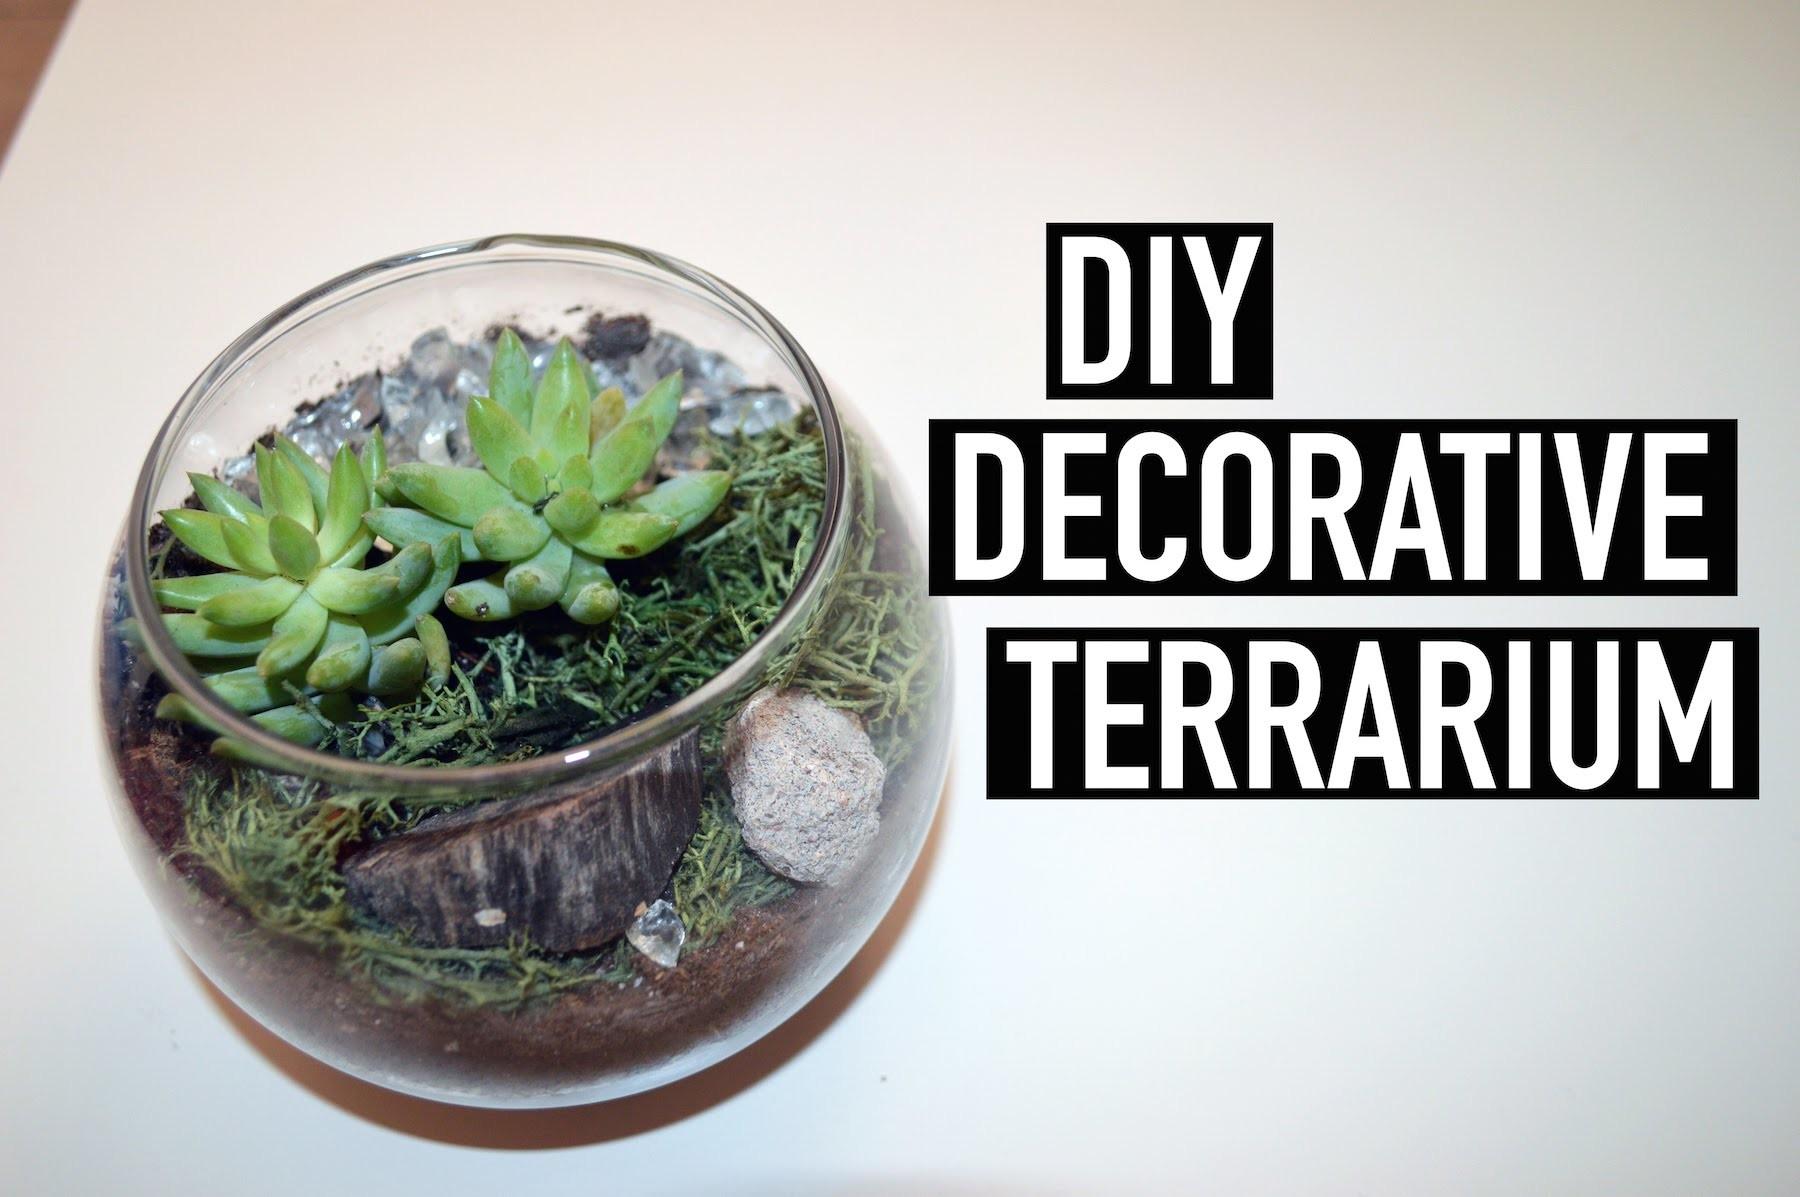 DIY Decorative Terrarium | The Fashion Citizen